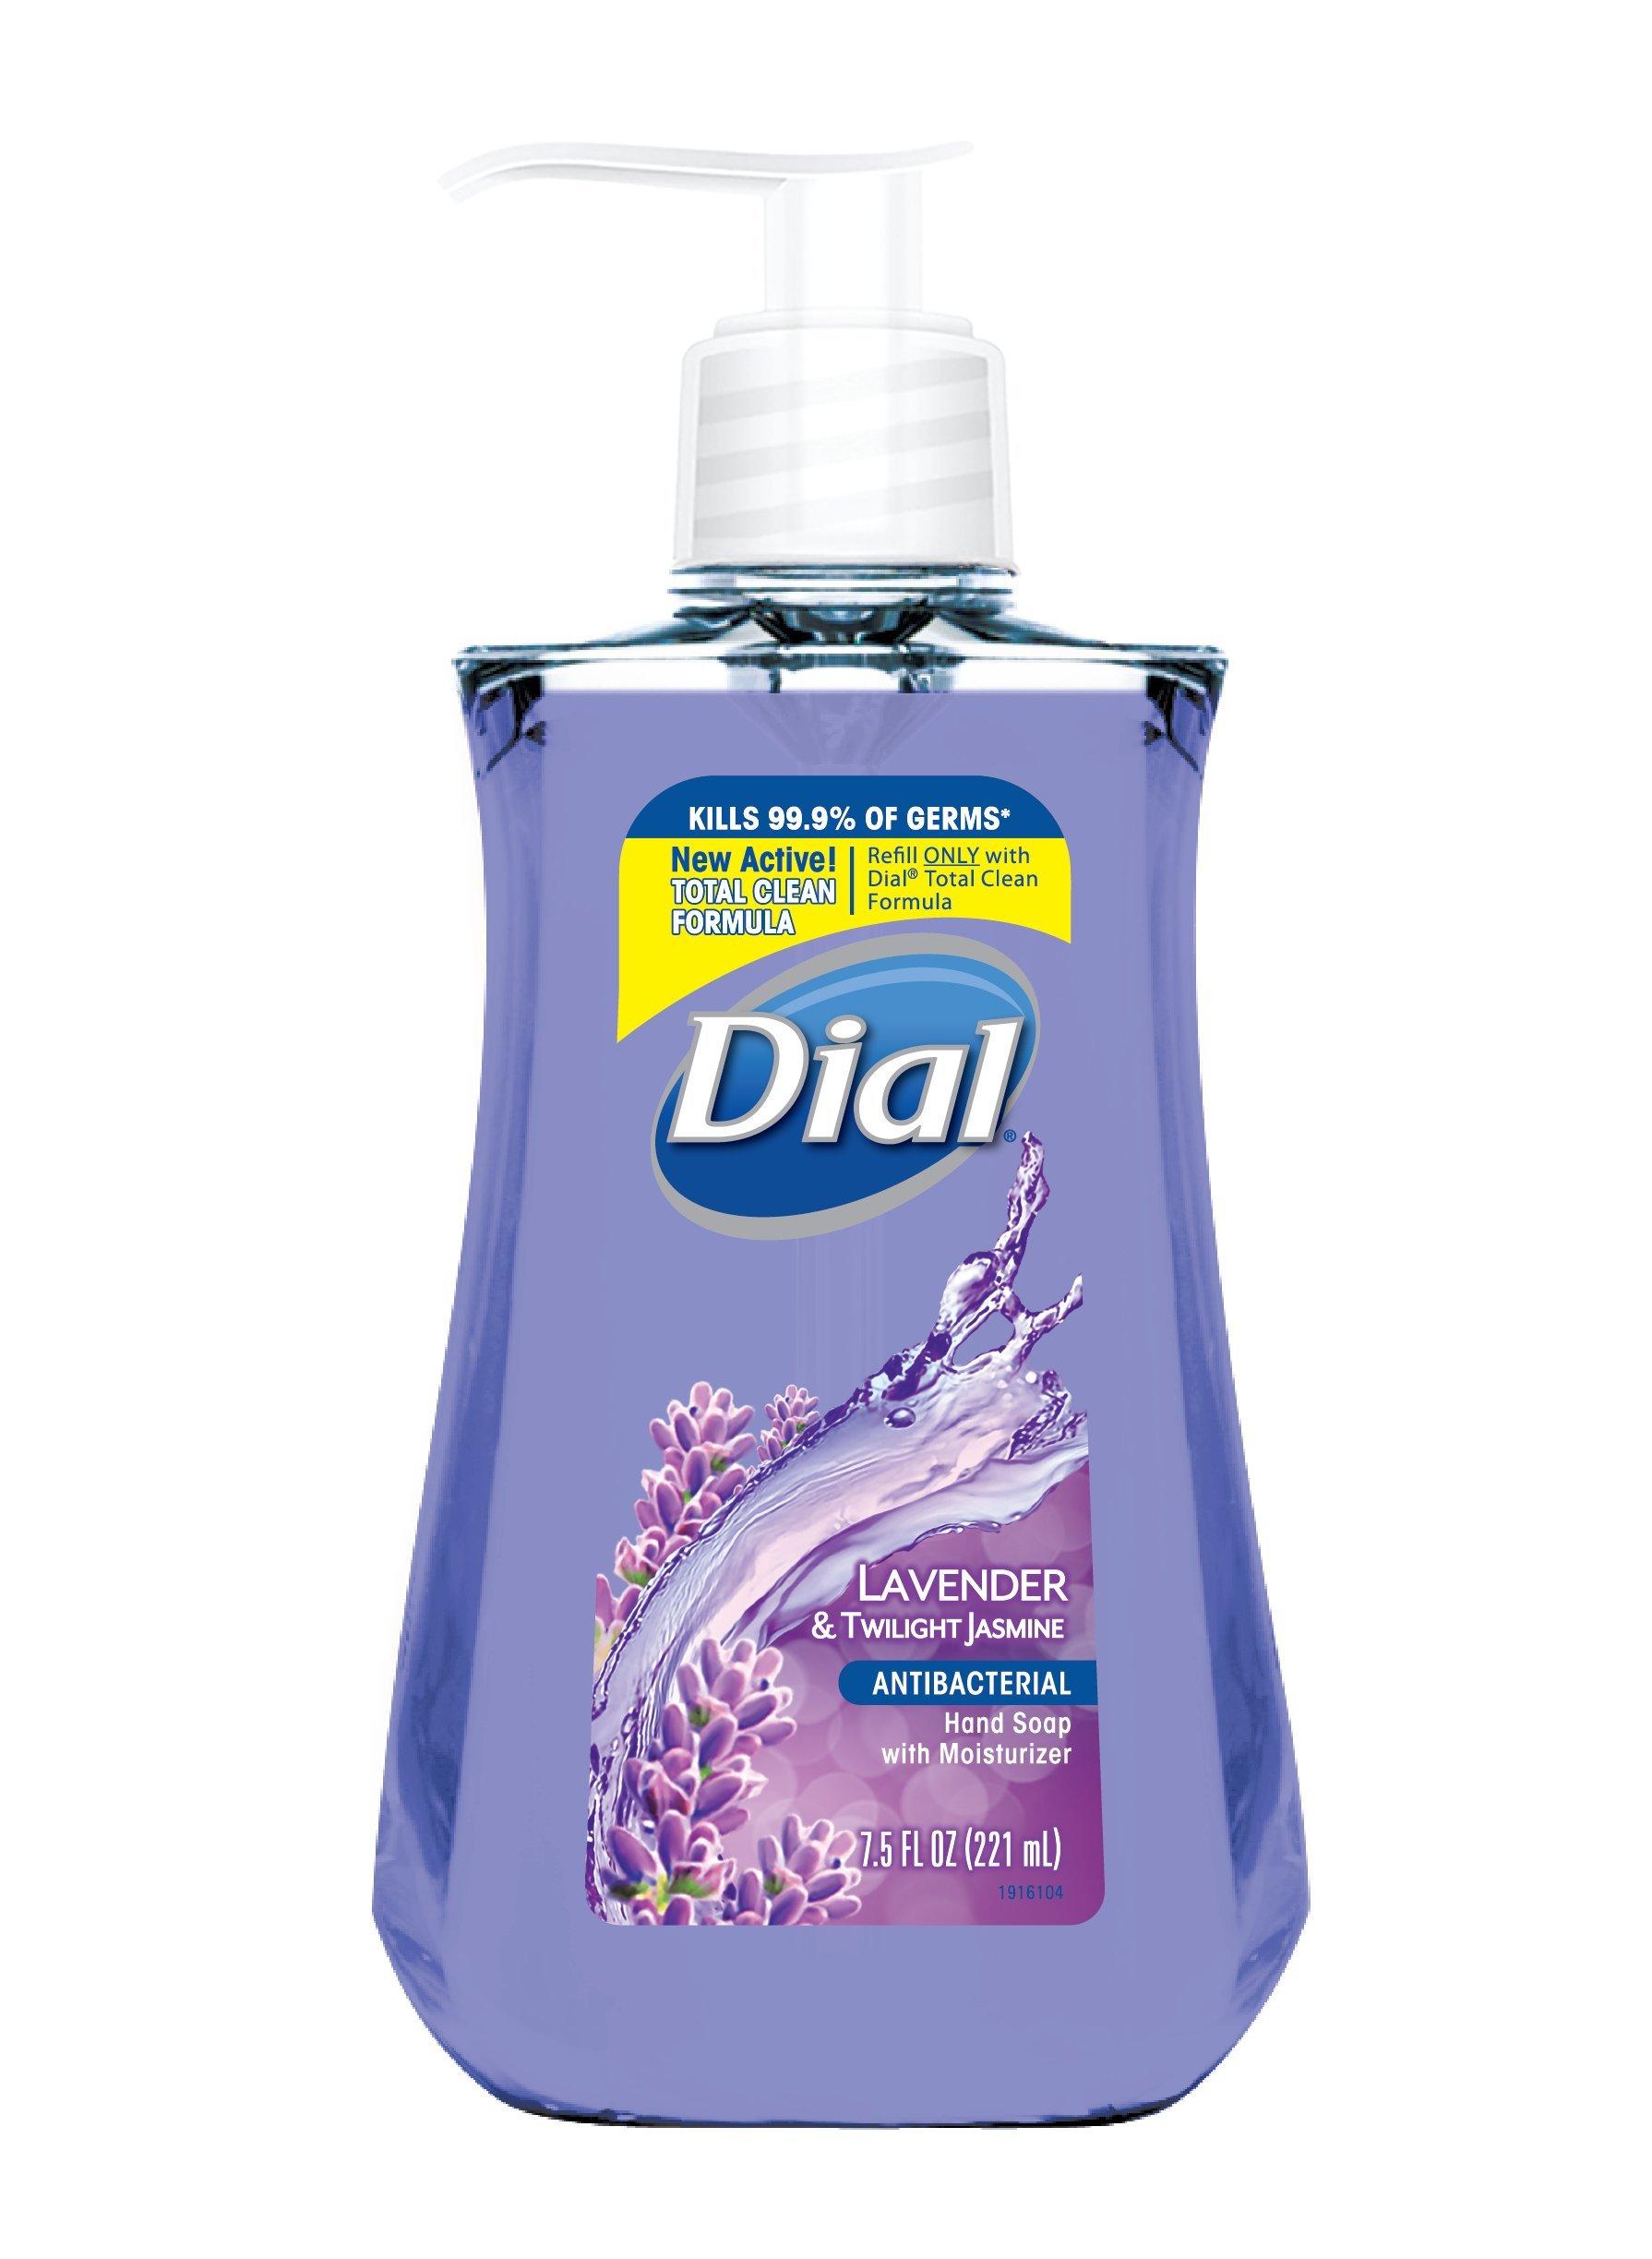 Dial Antibacterial Liquid Hand Soap, Lavender & Twilight Jasmine, 7.5 Fluid Ounces